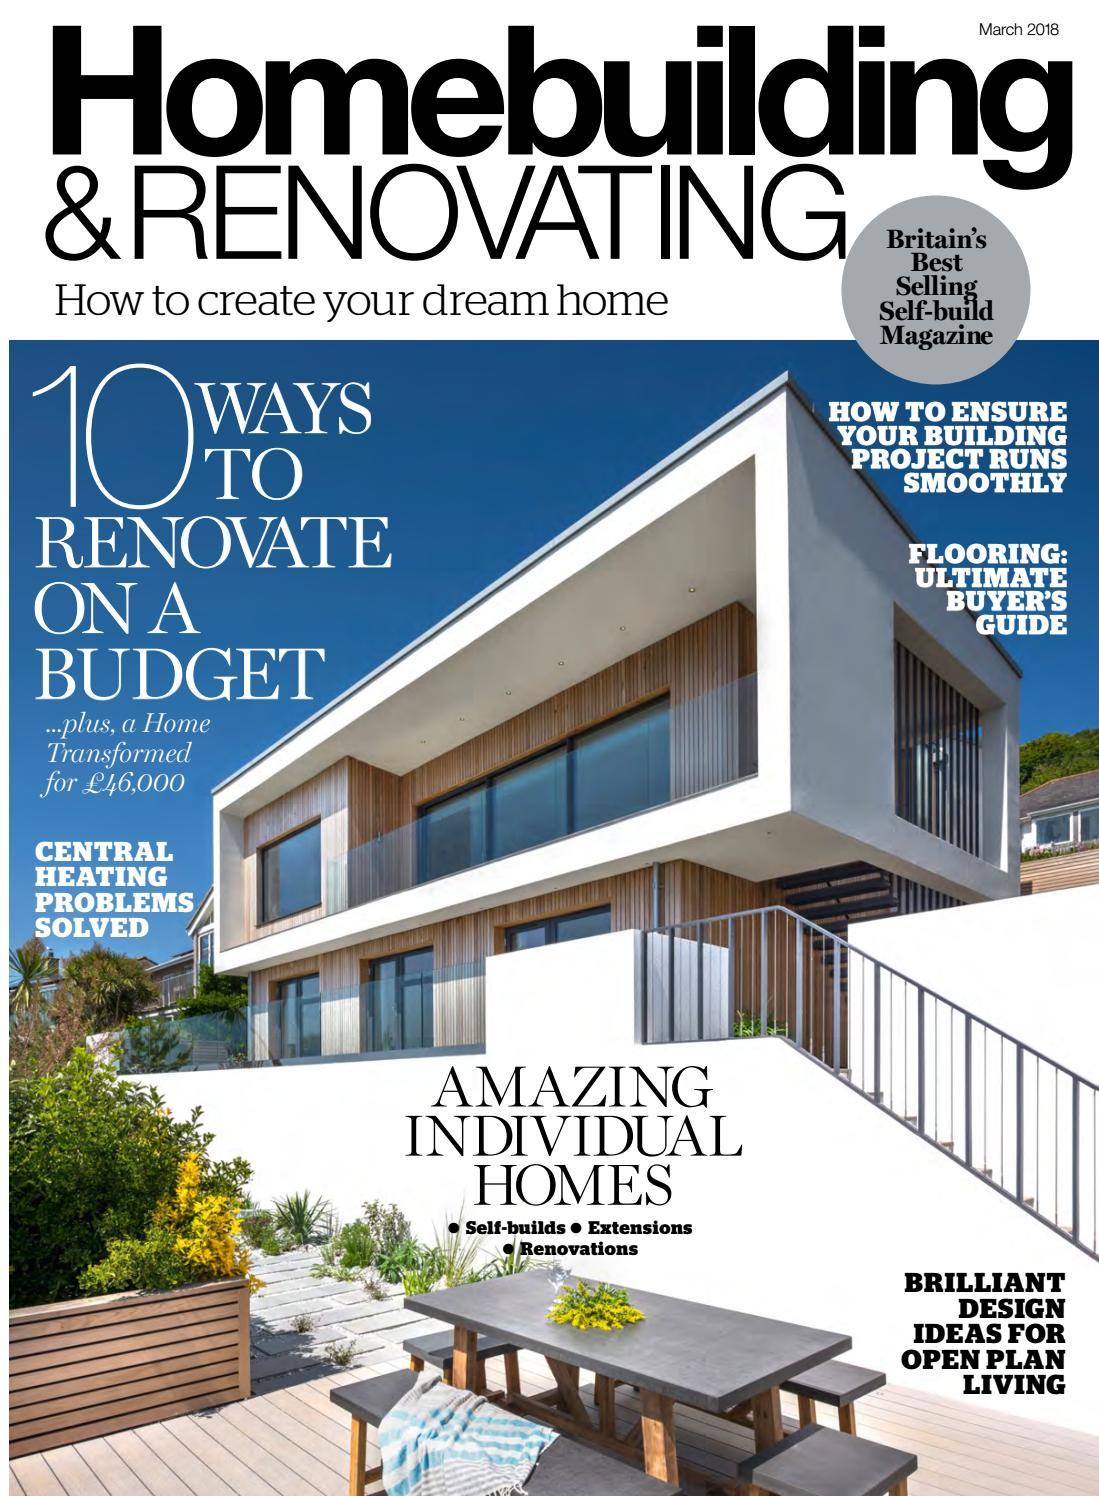 Homebuilding & Renovating 135 (Sampler) by Future PLC - issuu